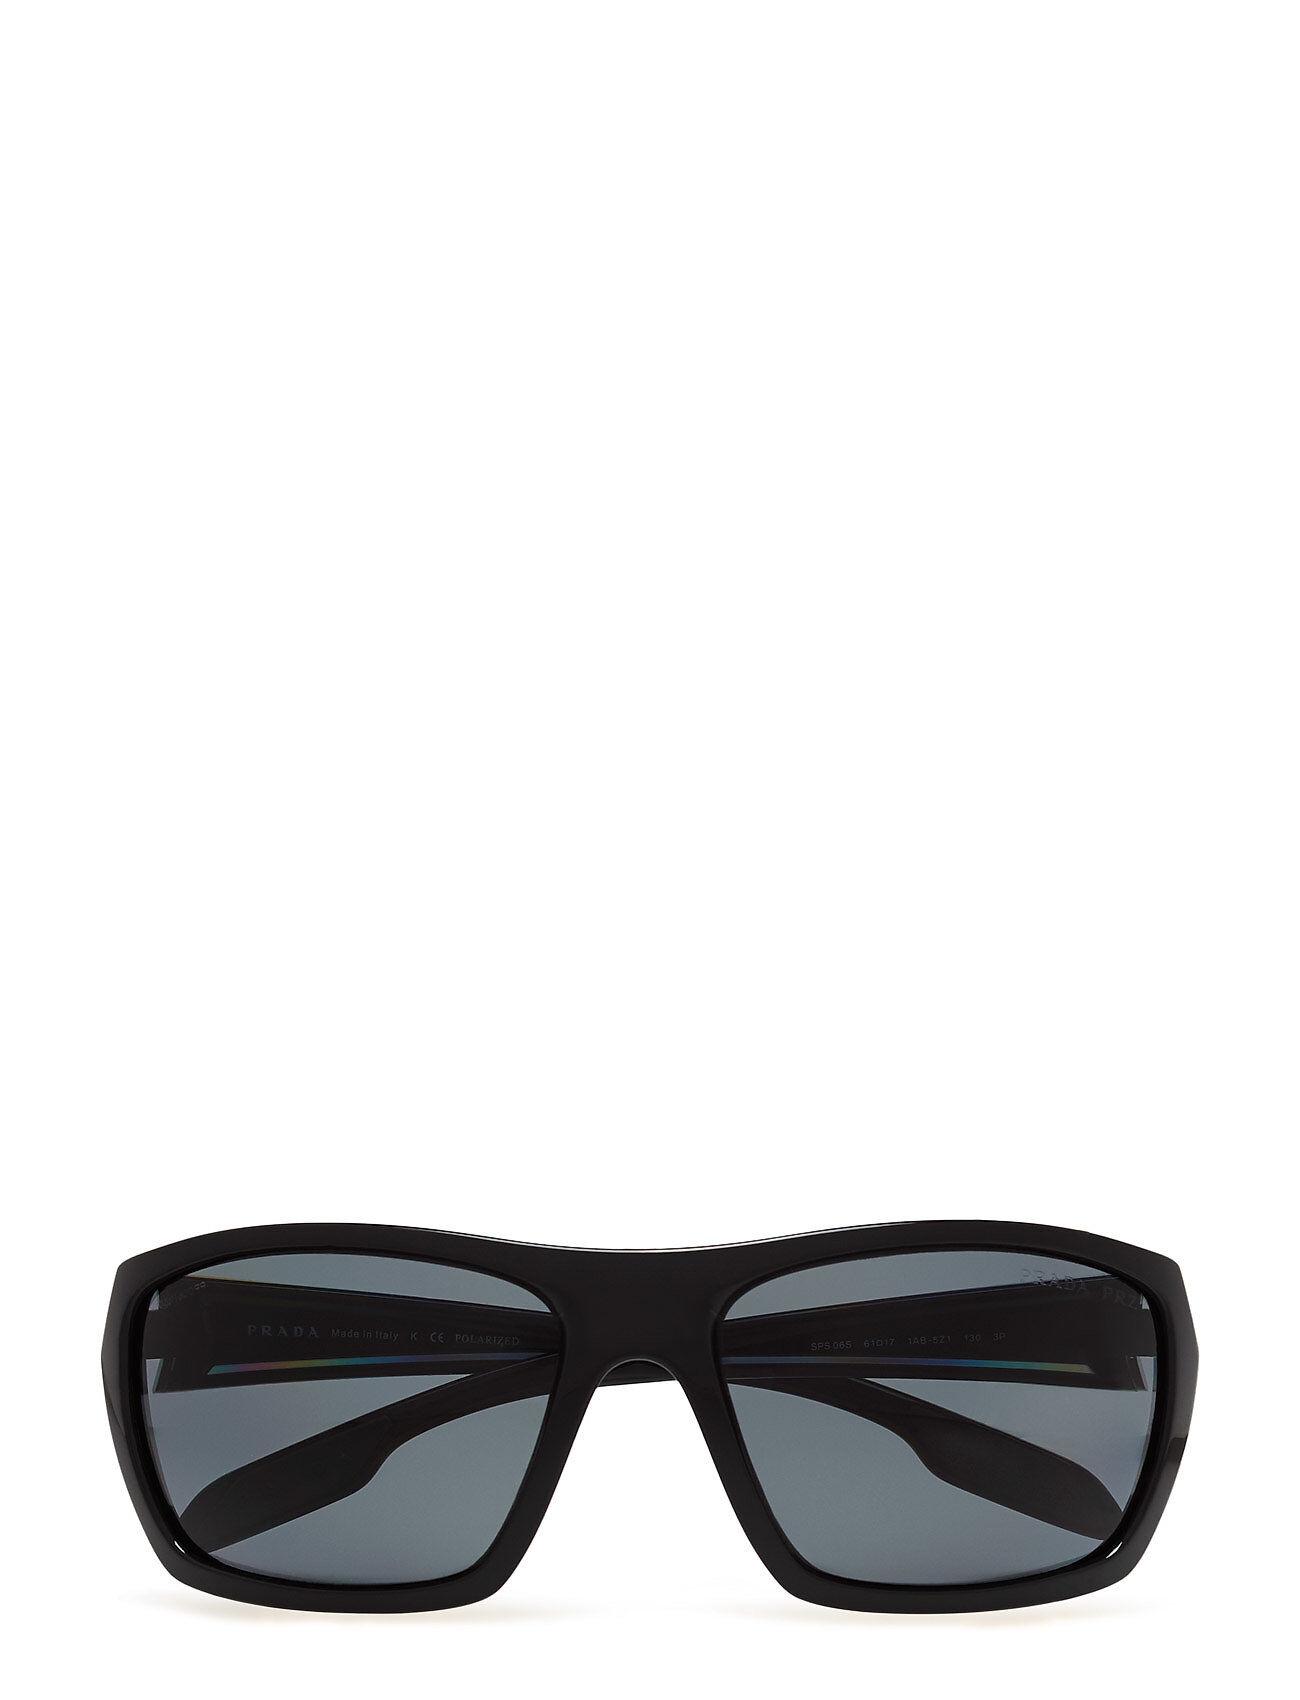 Image of Prada Sport Sunglasses 0ps 06ss Aurinkolasit Musta Prada Sport Sunglasses